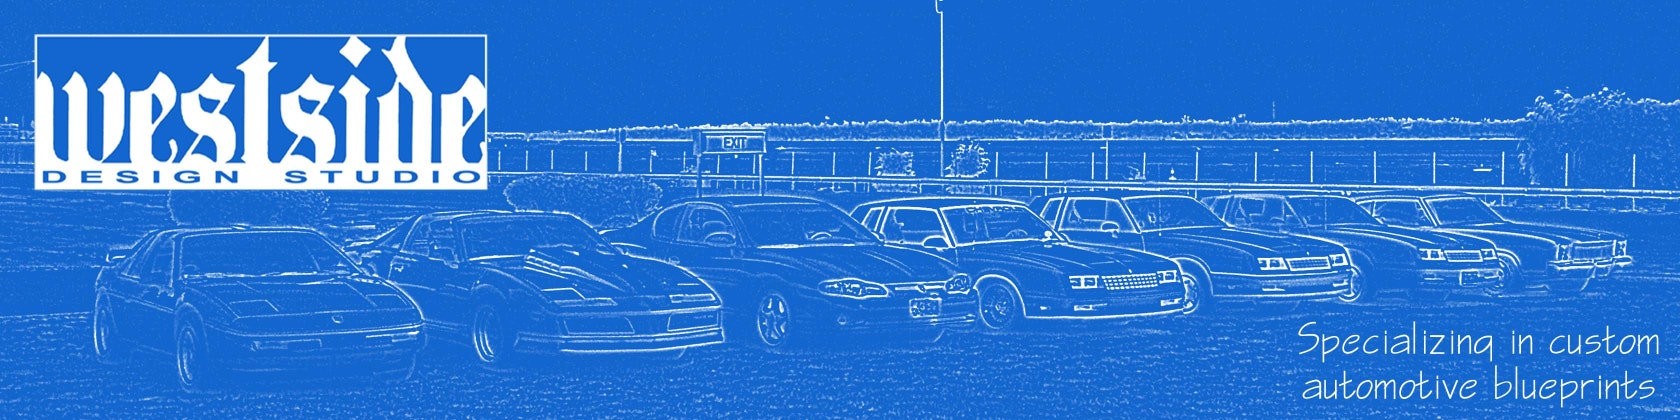 Custom automotive blueprints by WestsideDesignStudio on Etsy